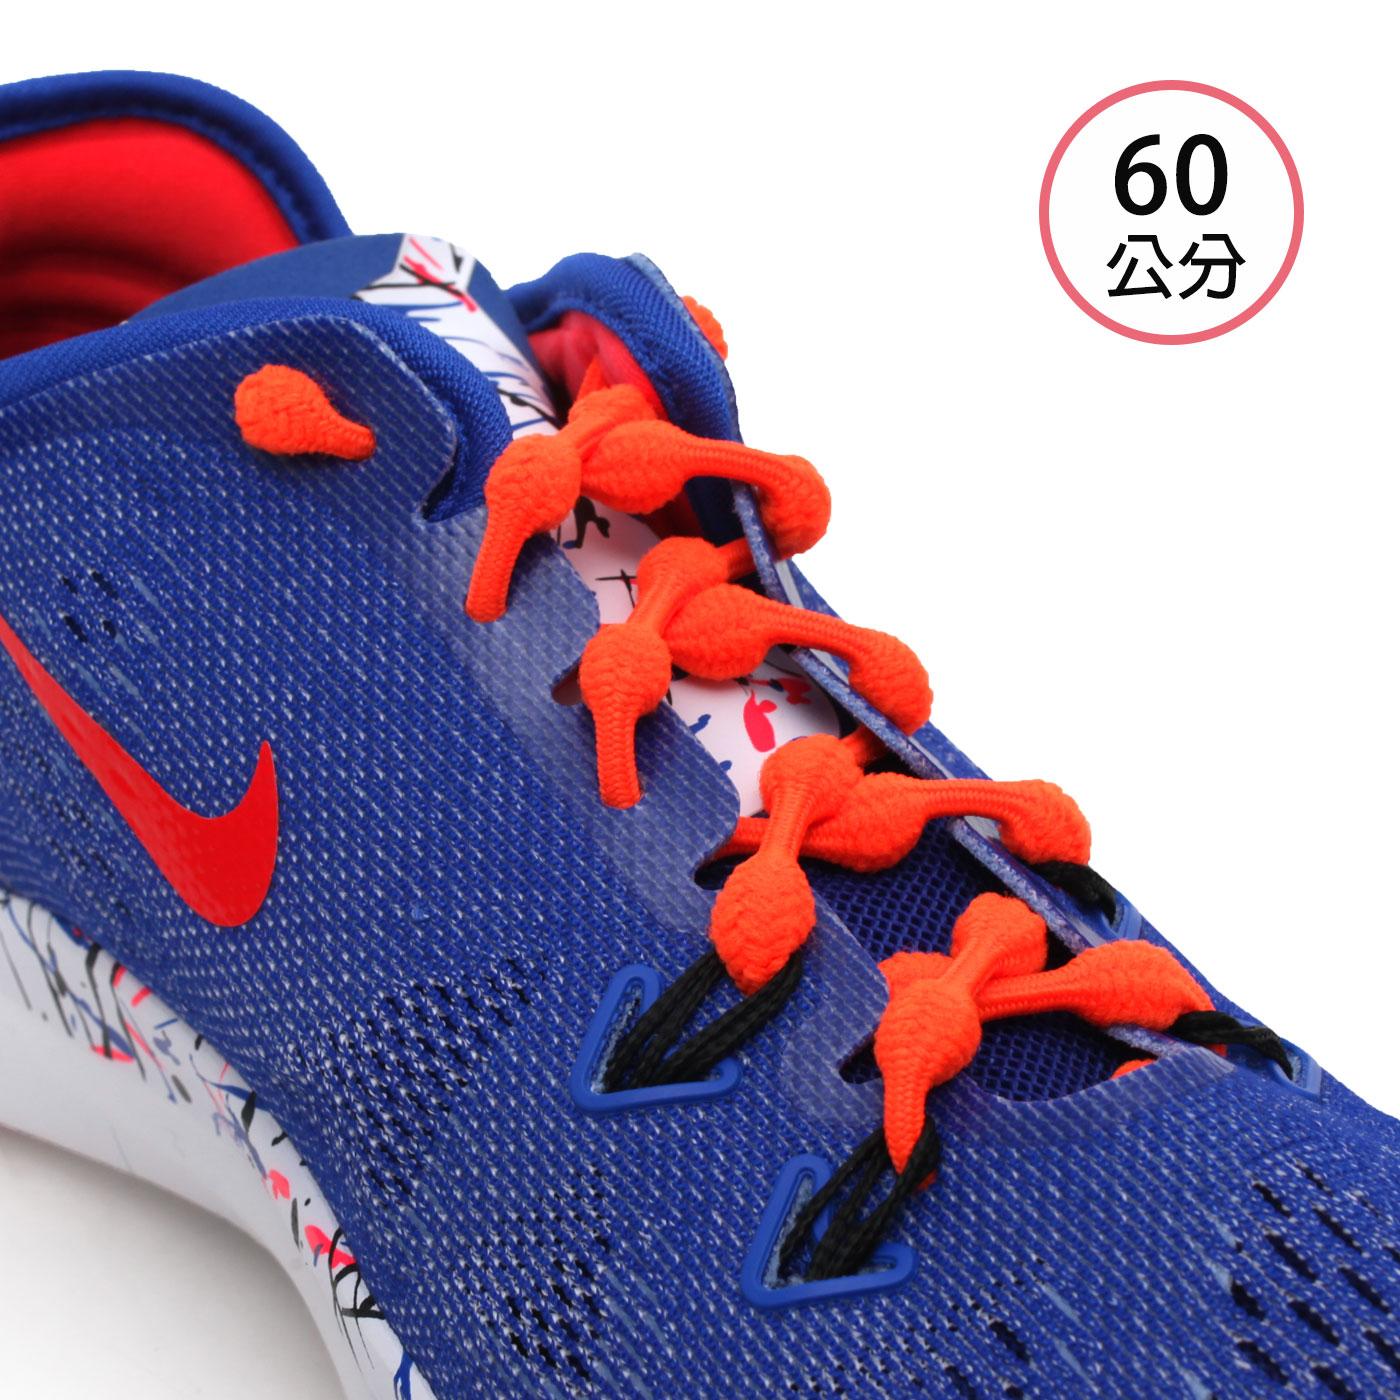 COOLKNOT 豆豆鞋帶(舒適款)60CM 6026201